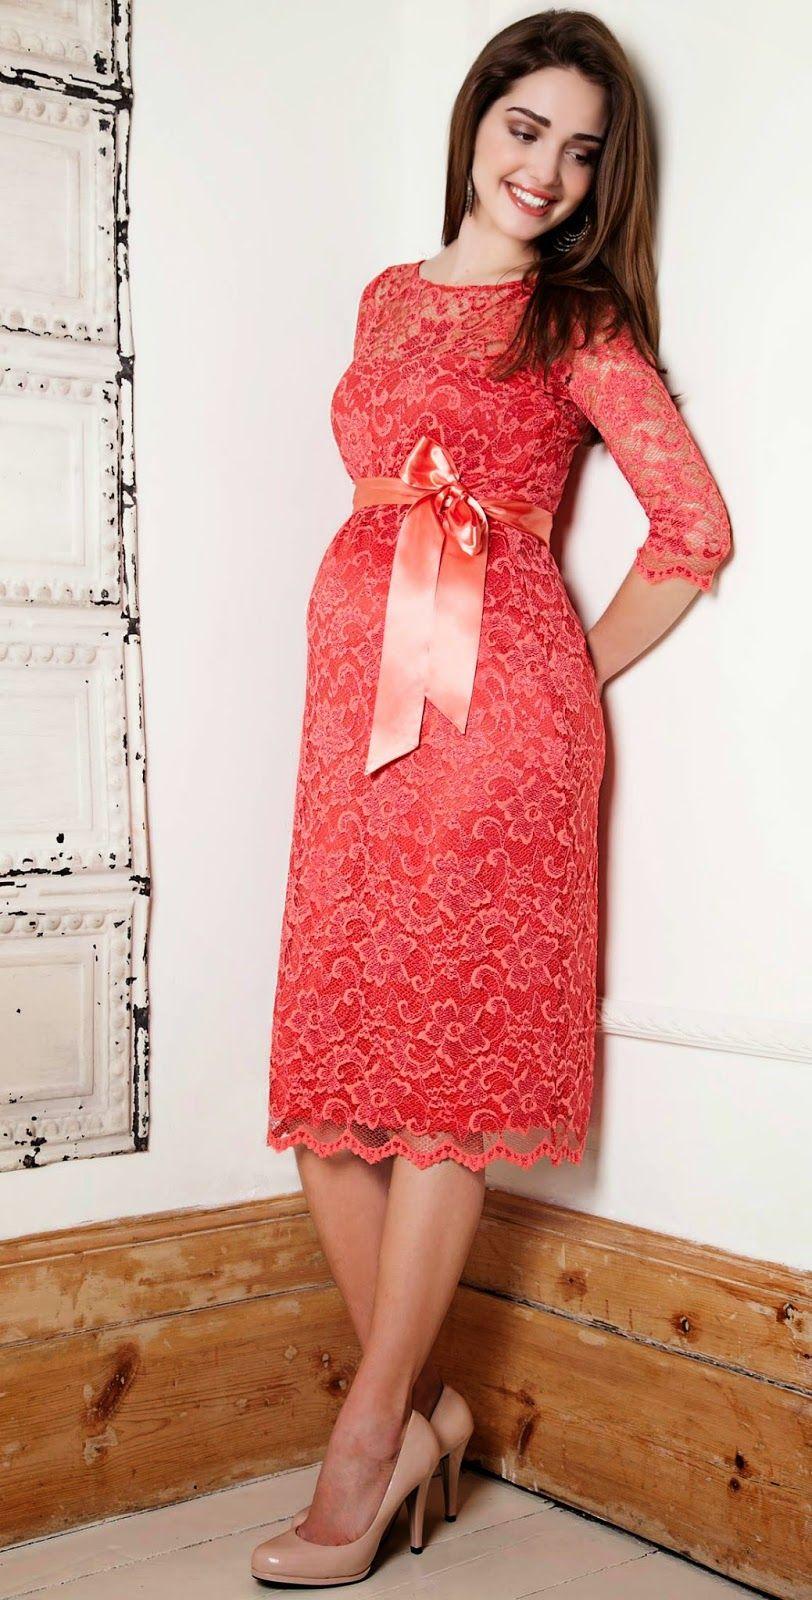 6bc33e600 Excelentes alternativas de vestidos de fiesta para embarazadas ...